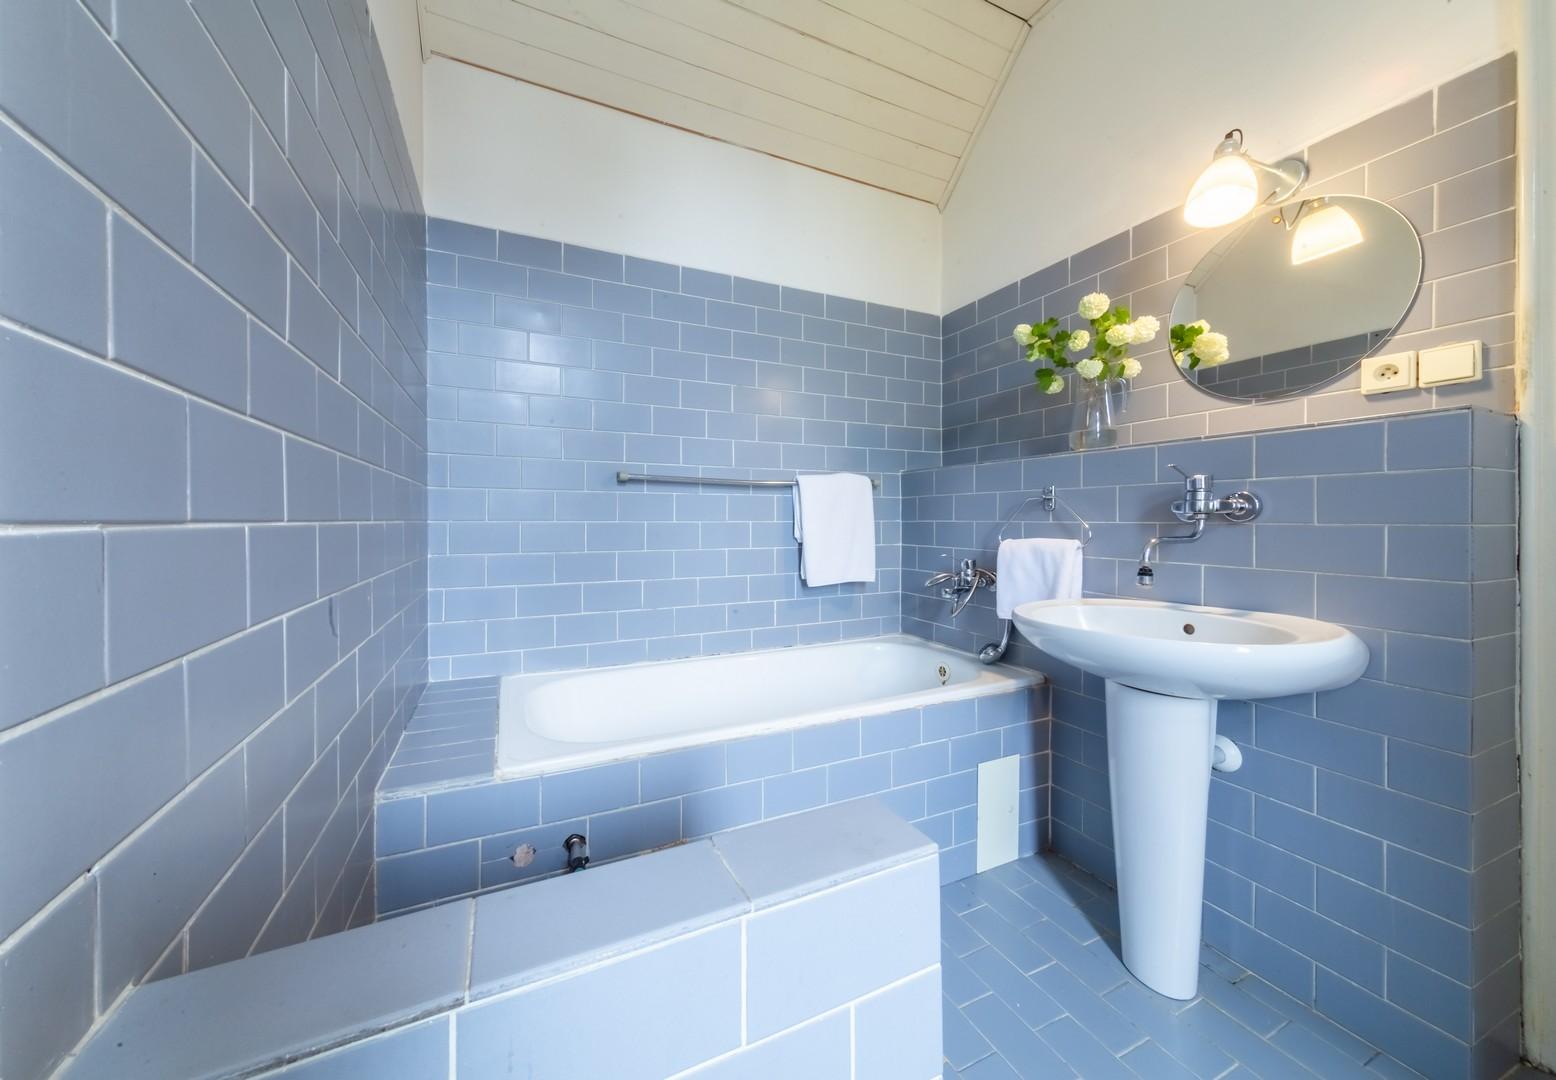 koupelna zrcadlo lampa vana umyvadlo kvetina rucnik